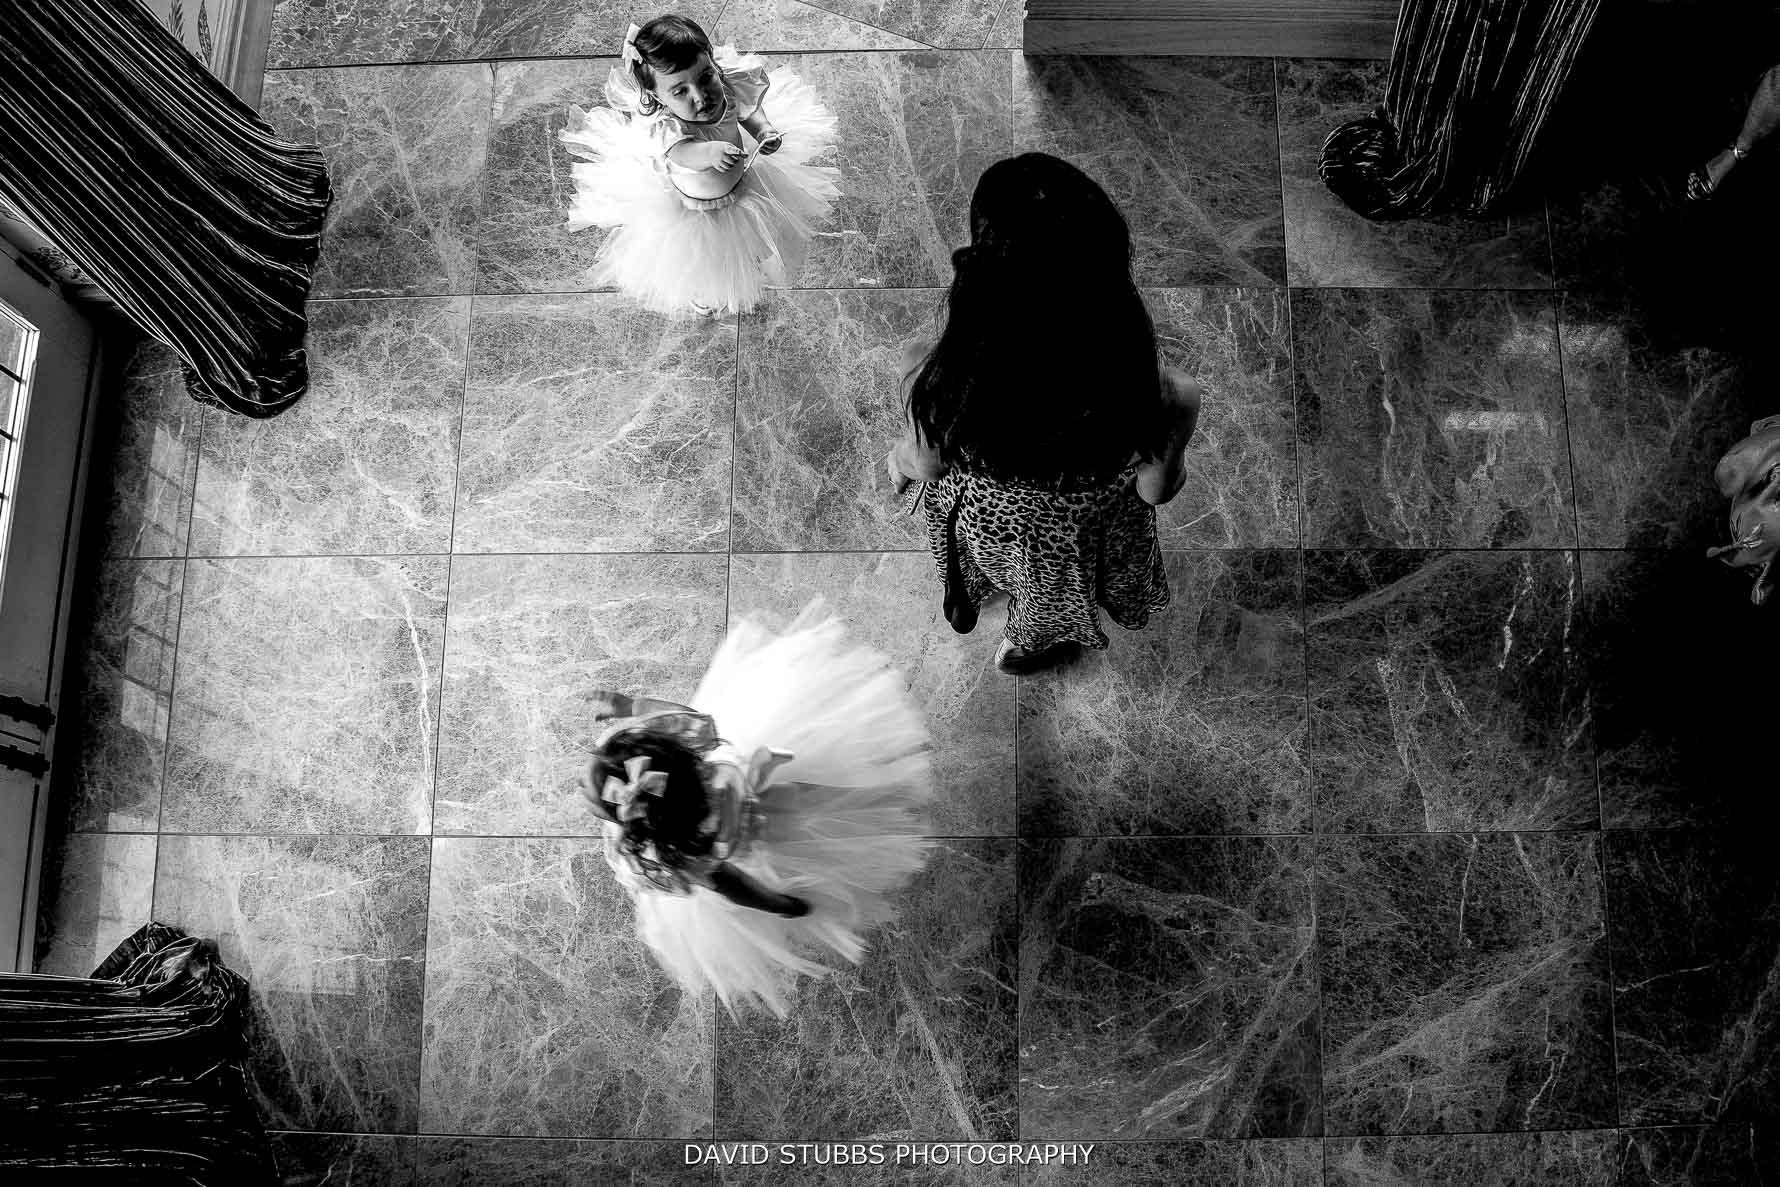 taken from above of the flower girls spinning